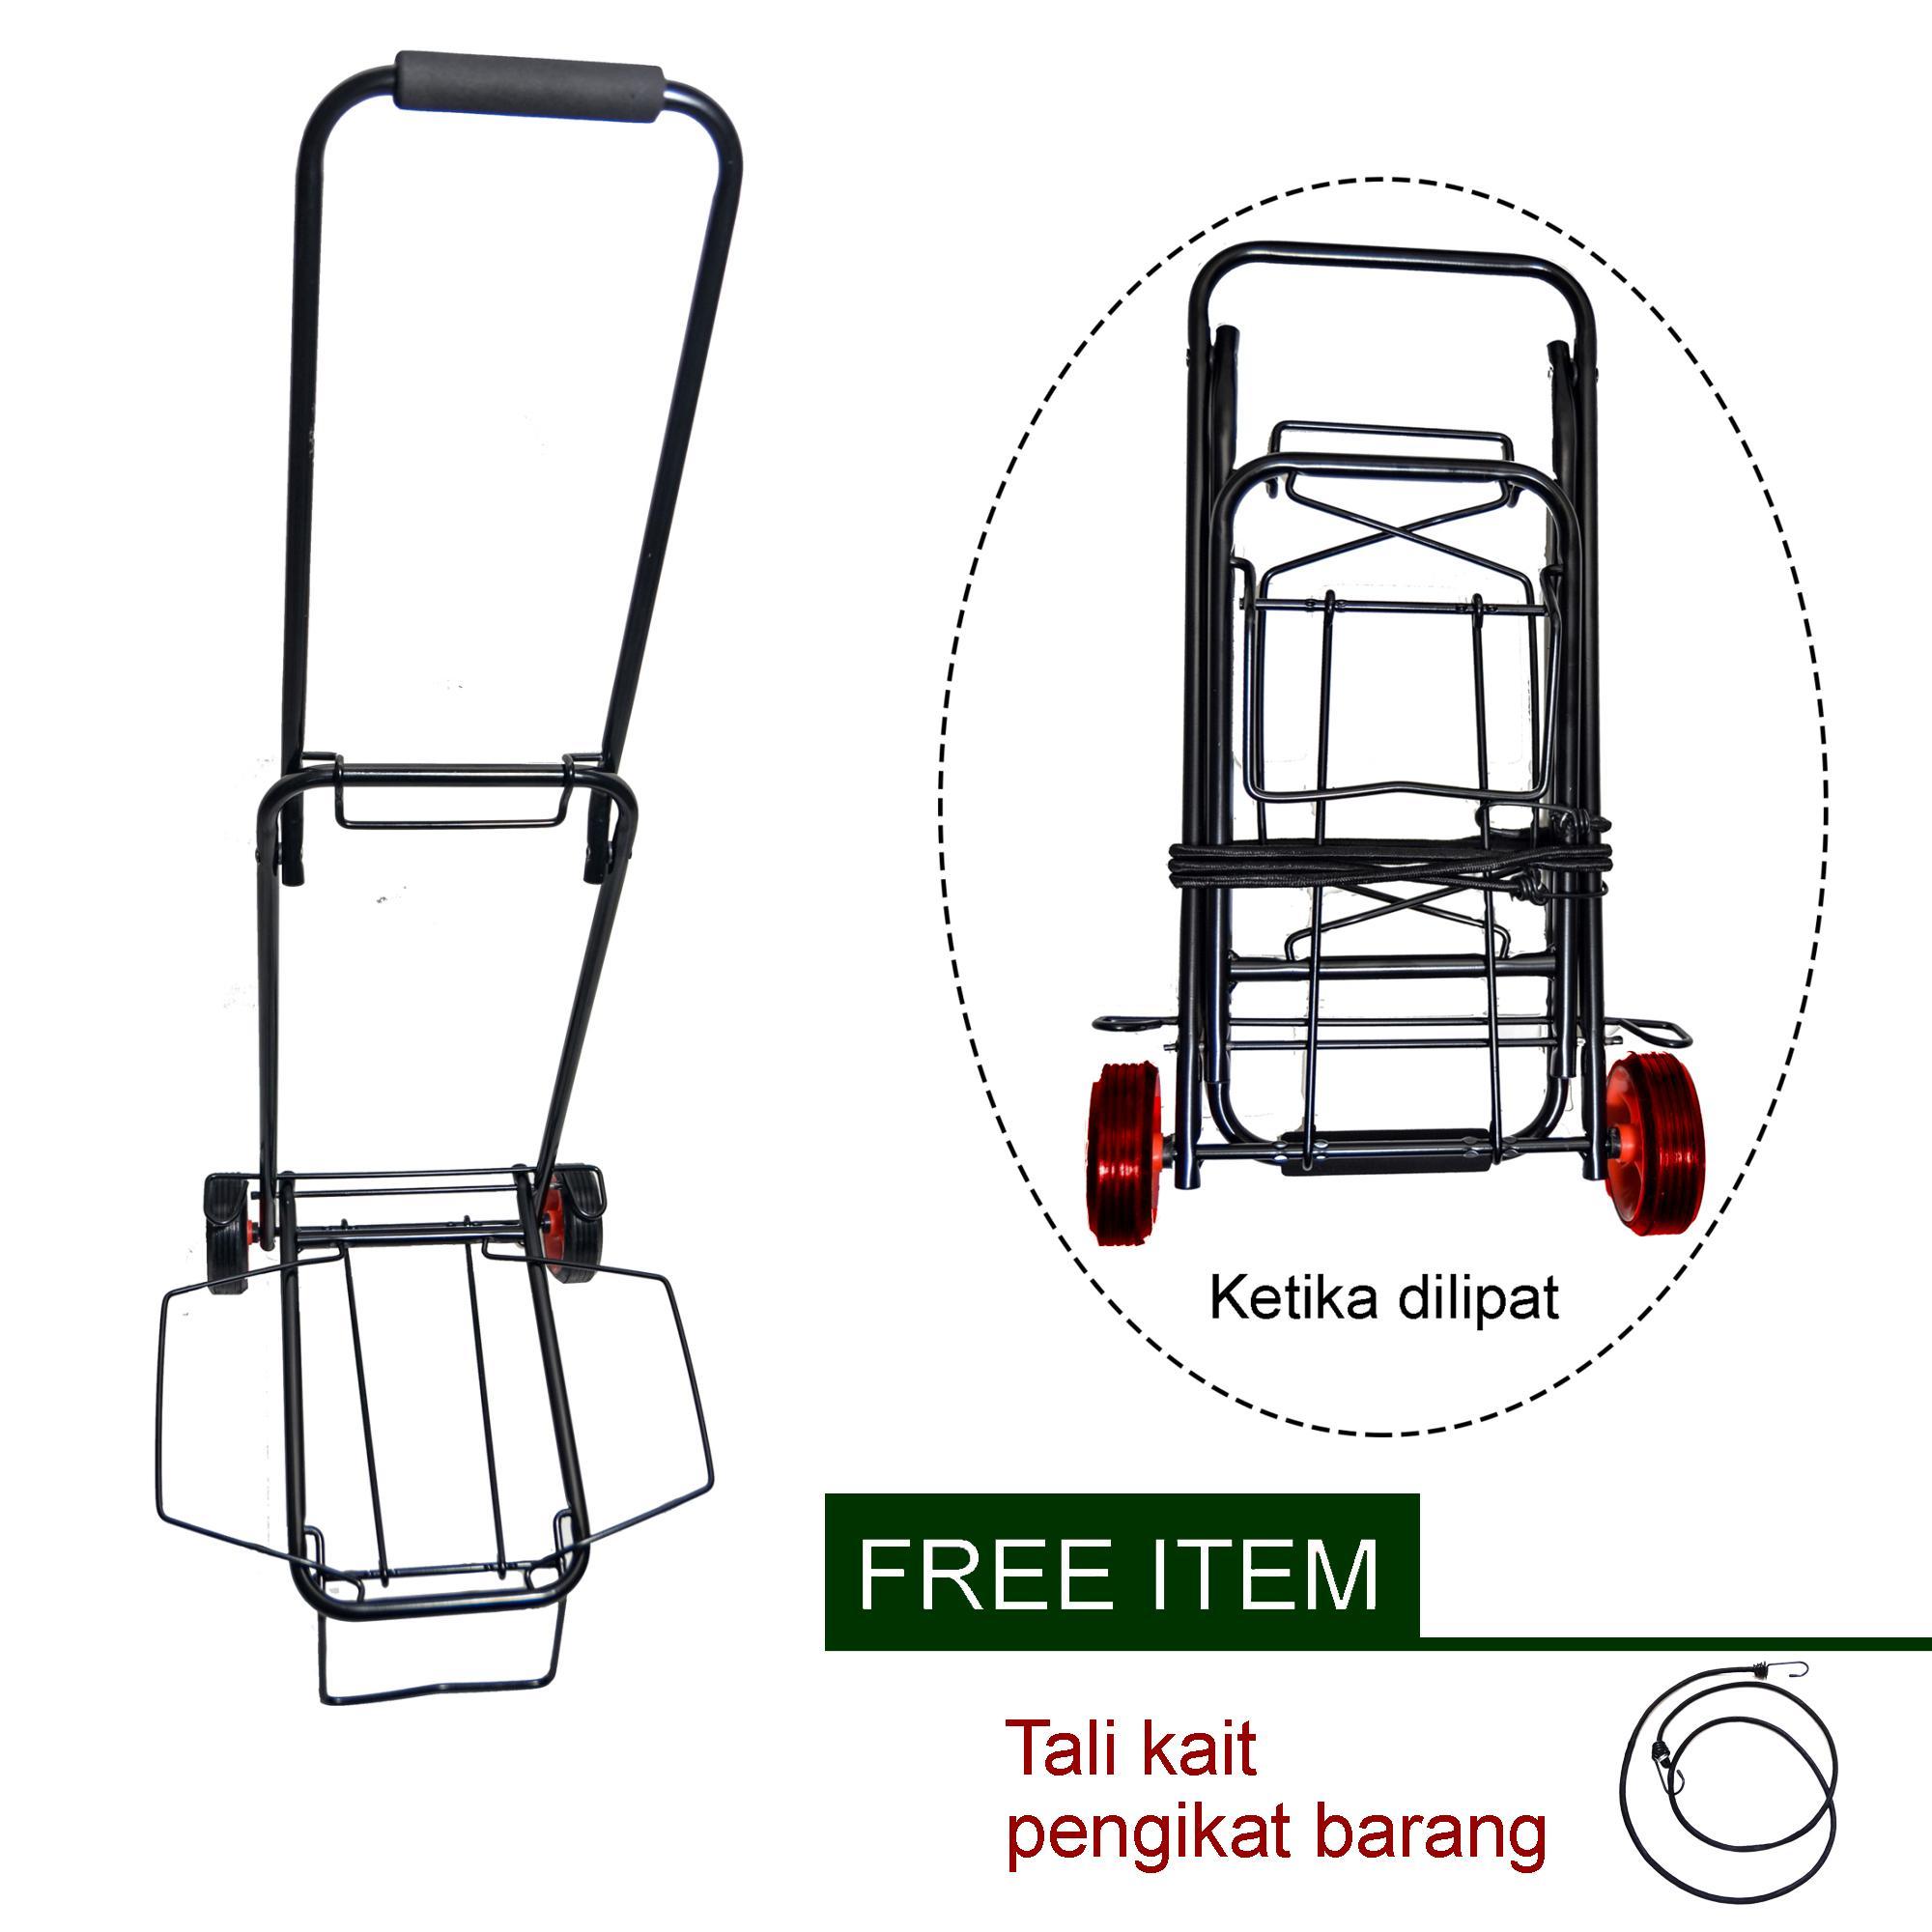 Jual Produk Foldable Trolley Bag Terbaru | lazada.co.id